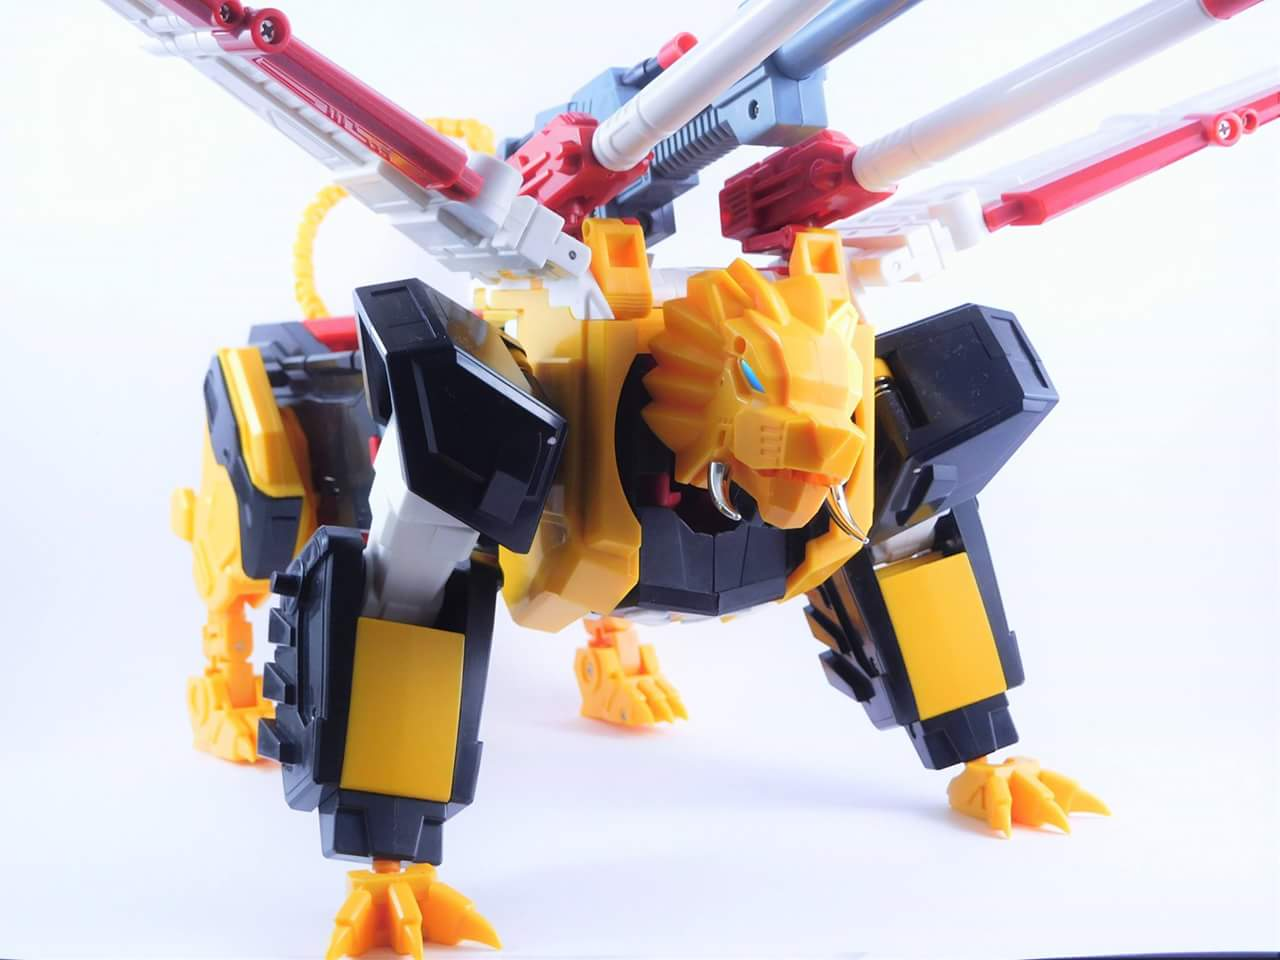 [KFC Toys] Produit Tiers - Jouet Phase 8-A Simba - aka Victory Leo (Transformers Victory) - Page 2 JOGBezpg